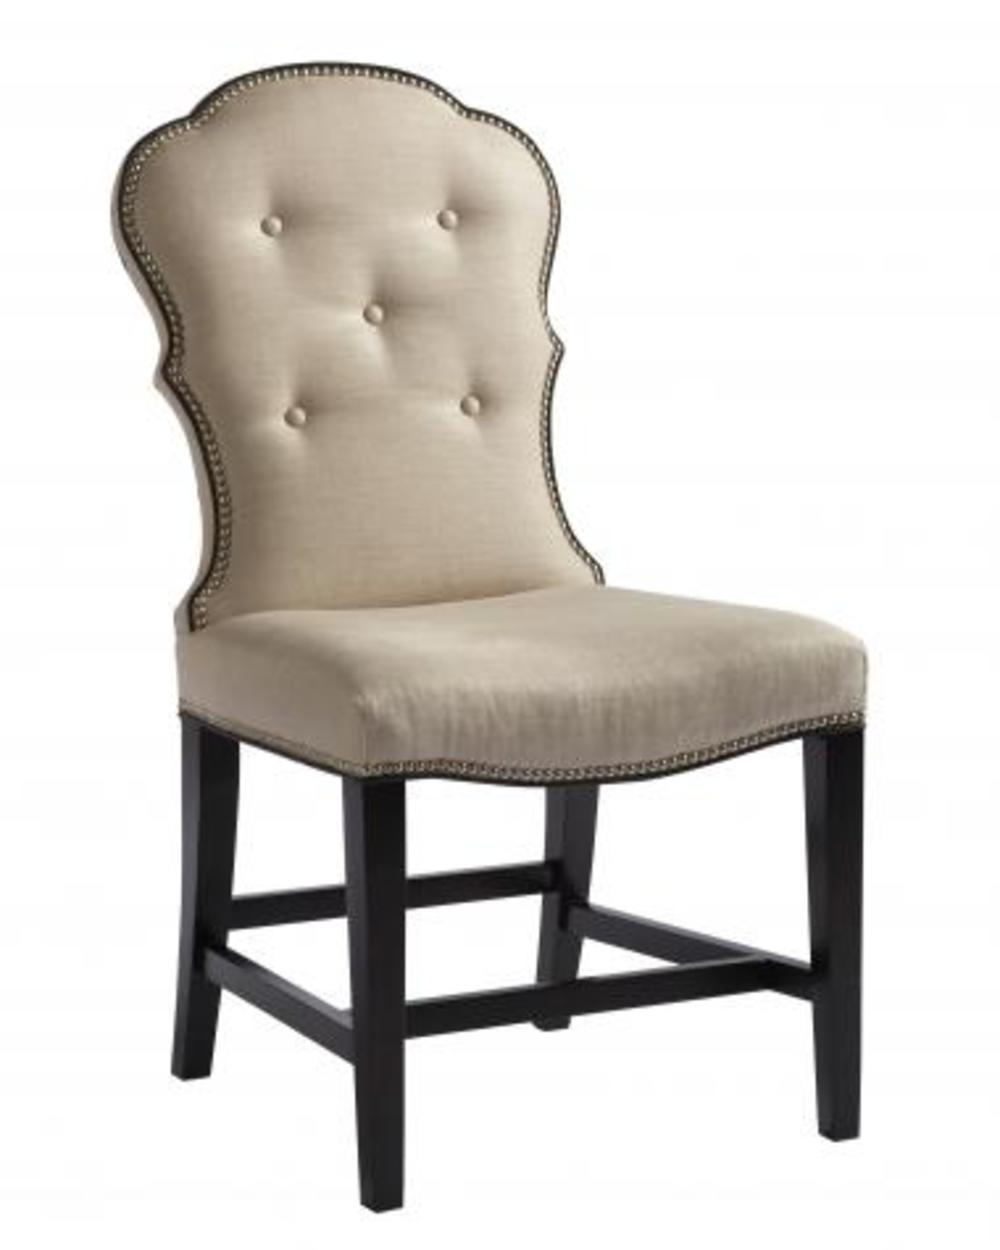 Lillian August Fine Furniture - Arden Park Chair